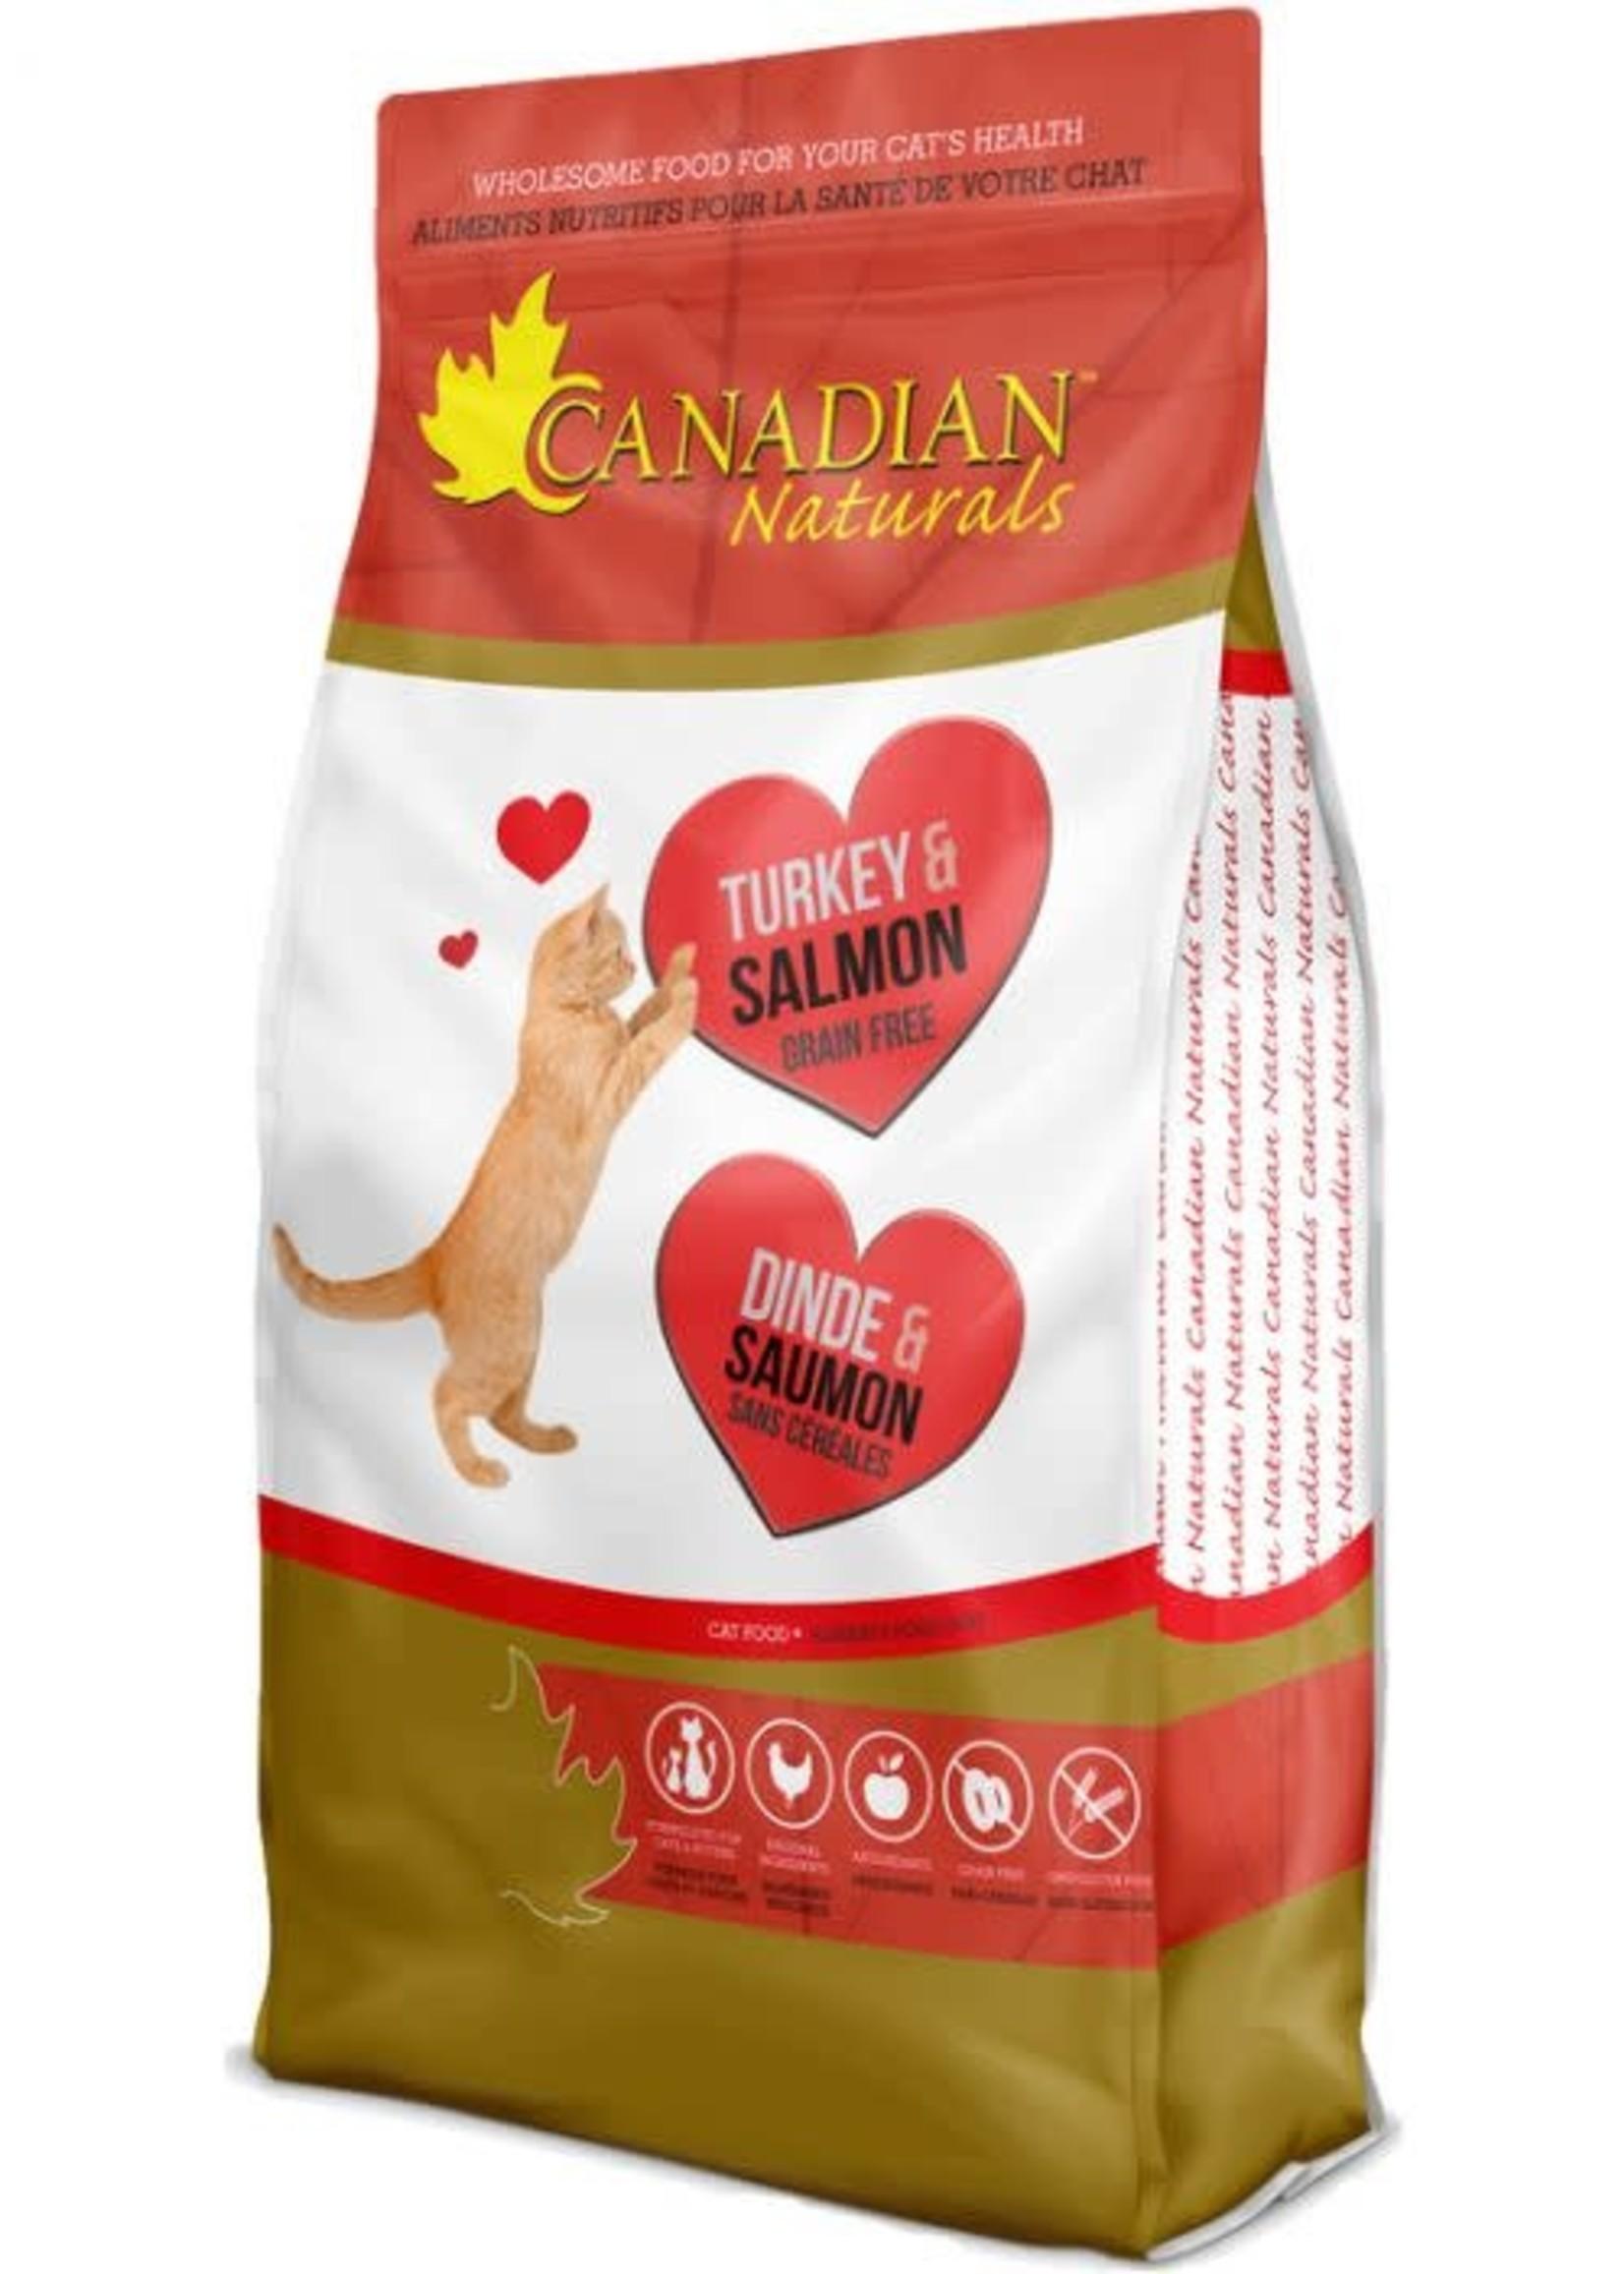 Canadian Naturals® CANADIAN NATURALS GRAIN FREE TURKEY & SALMON 6.5lbs